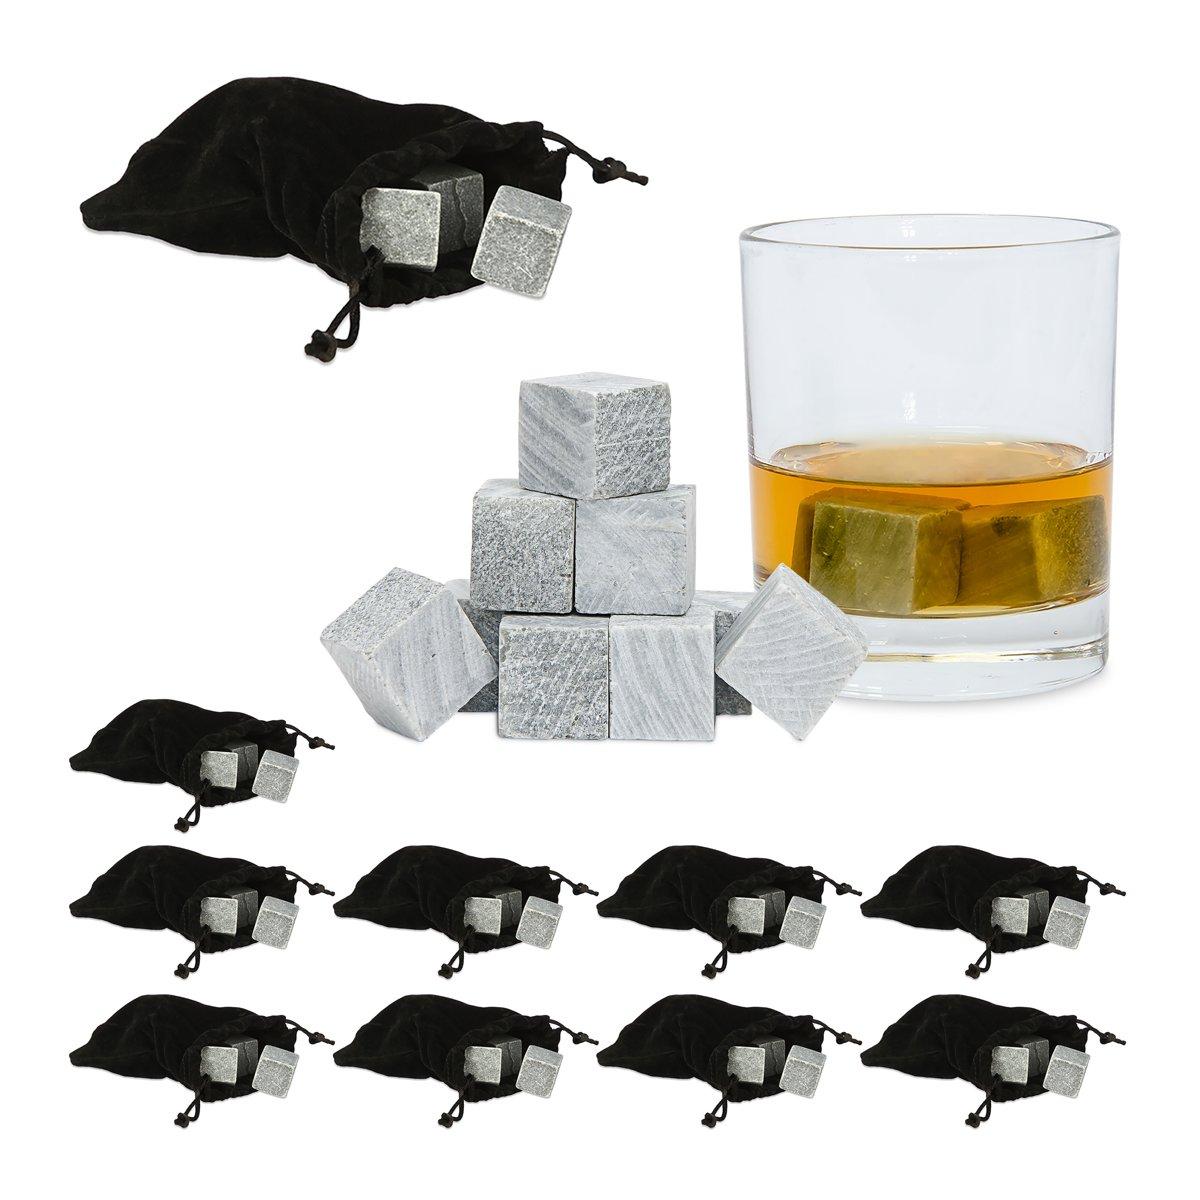 relaxdays 90 x whiskey stenen, whiskey stones, grijs, ijsklontjes, smaakloos, stofzak kopen